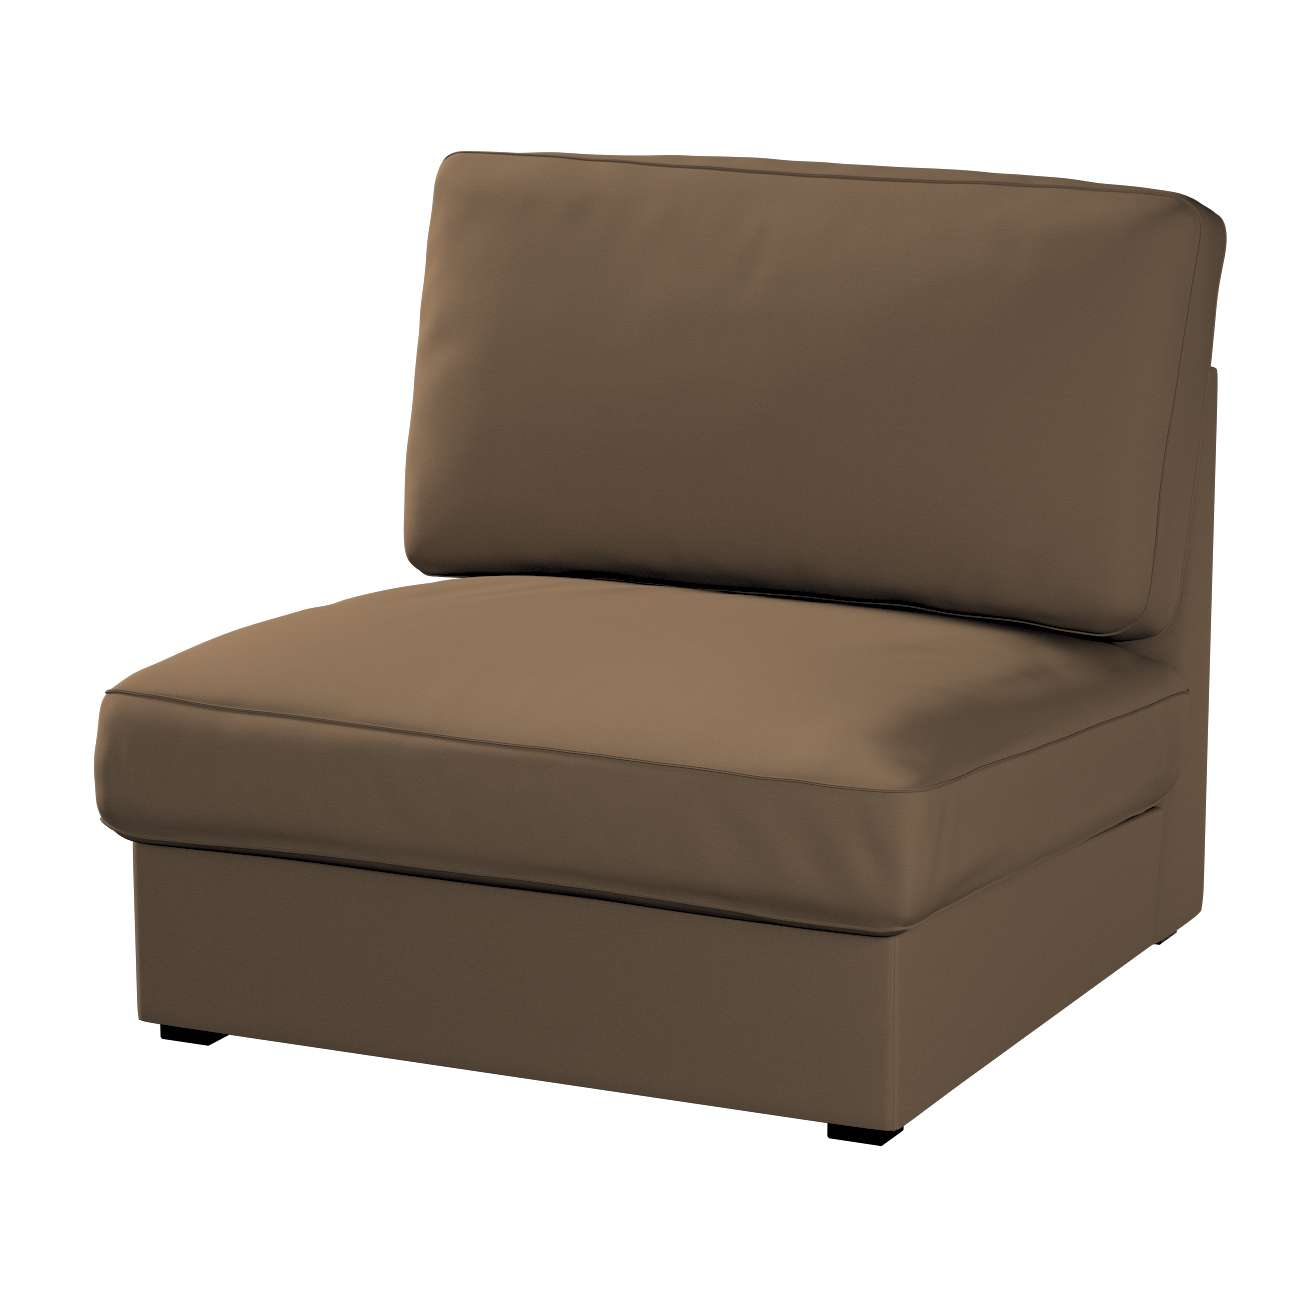 Pokrowiec na fotel Kivik Fotel Kivik w kolekcji Cotton Panama, tkanina: 702-02